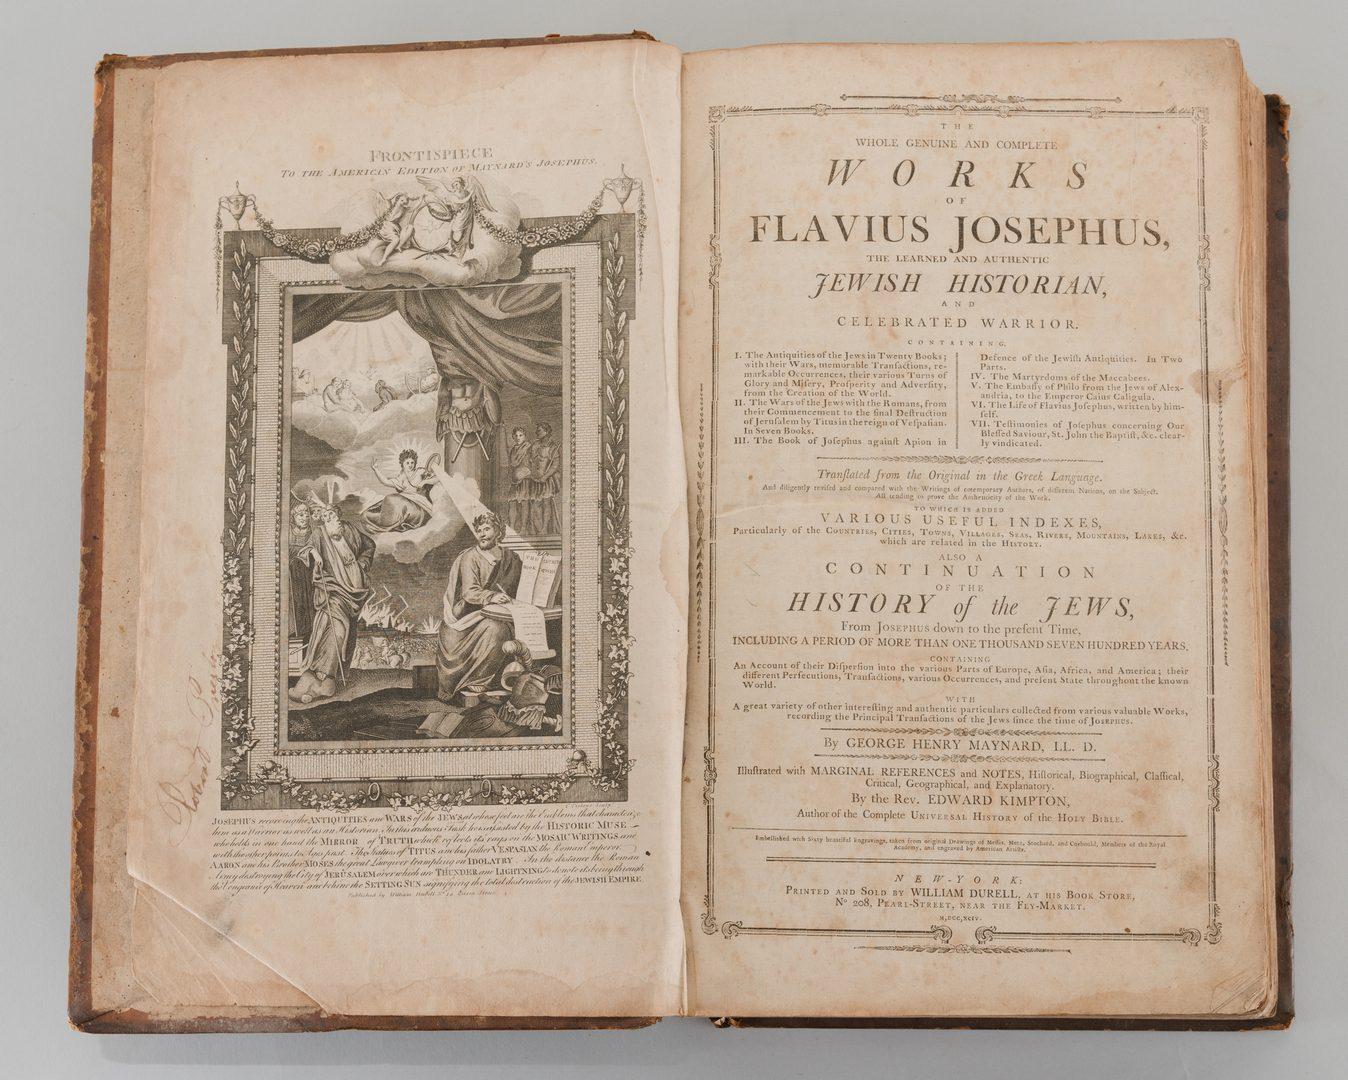 Lot 557: Works of Flavius Josephus, Maynard 1794